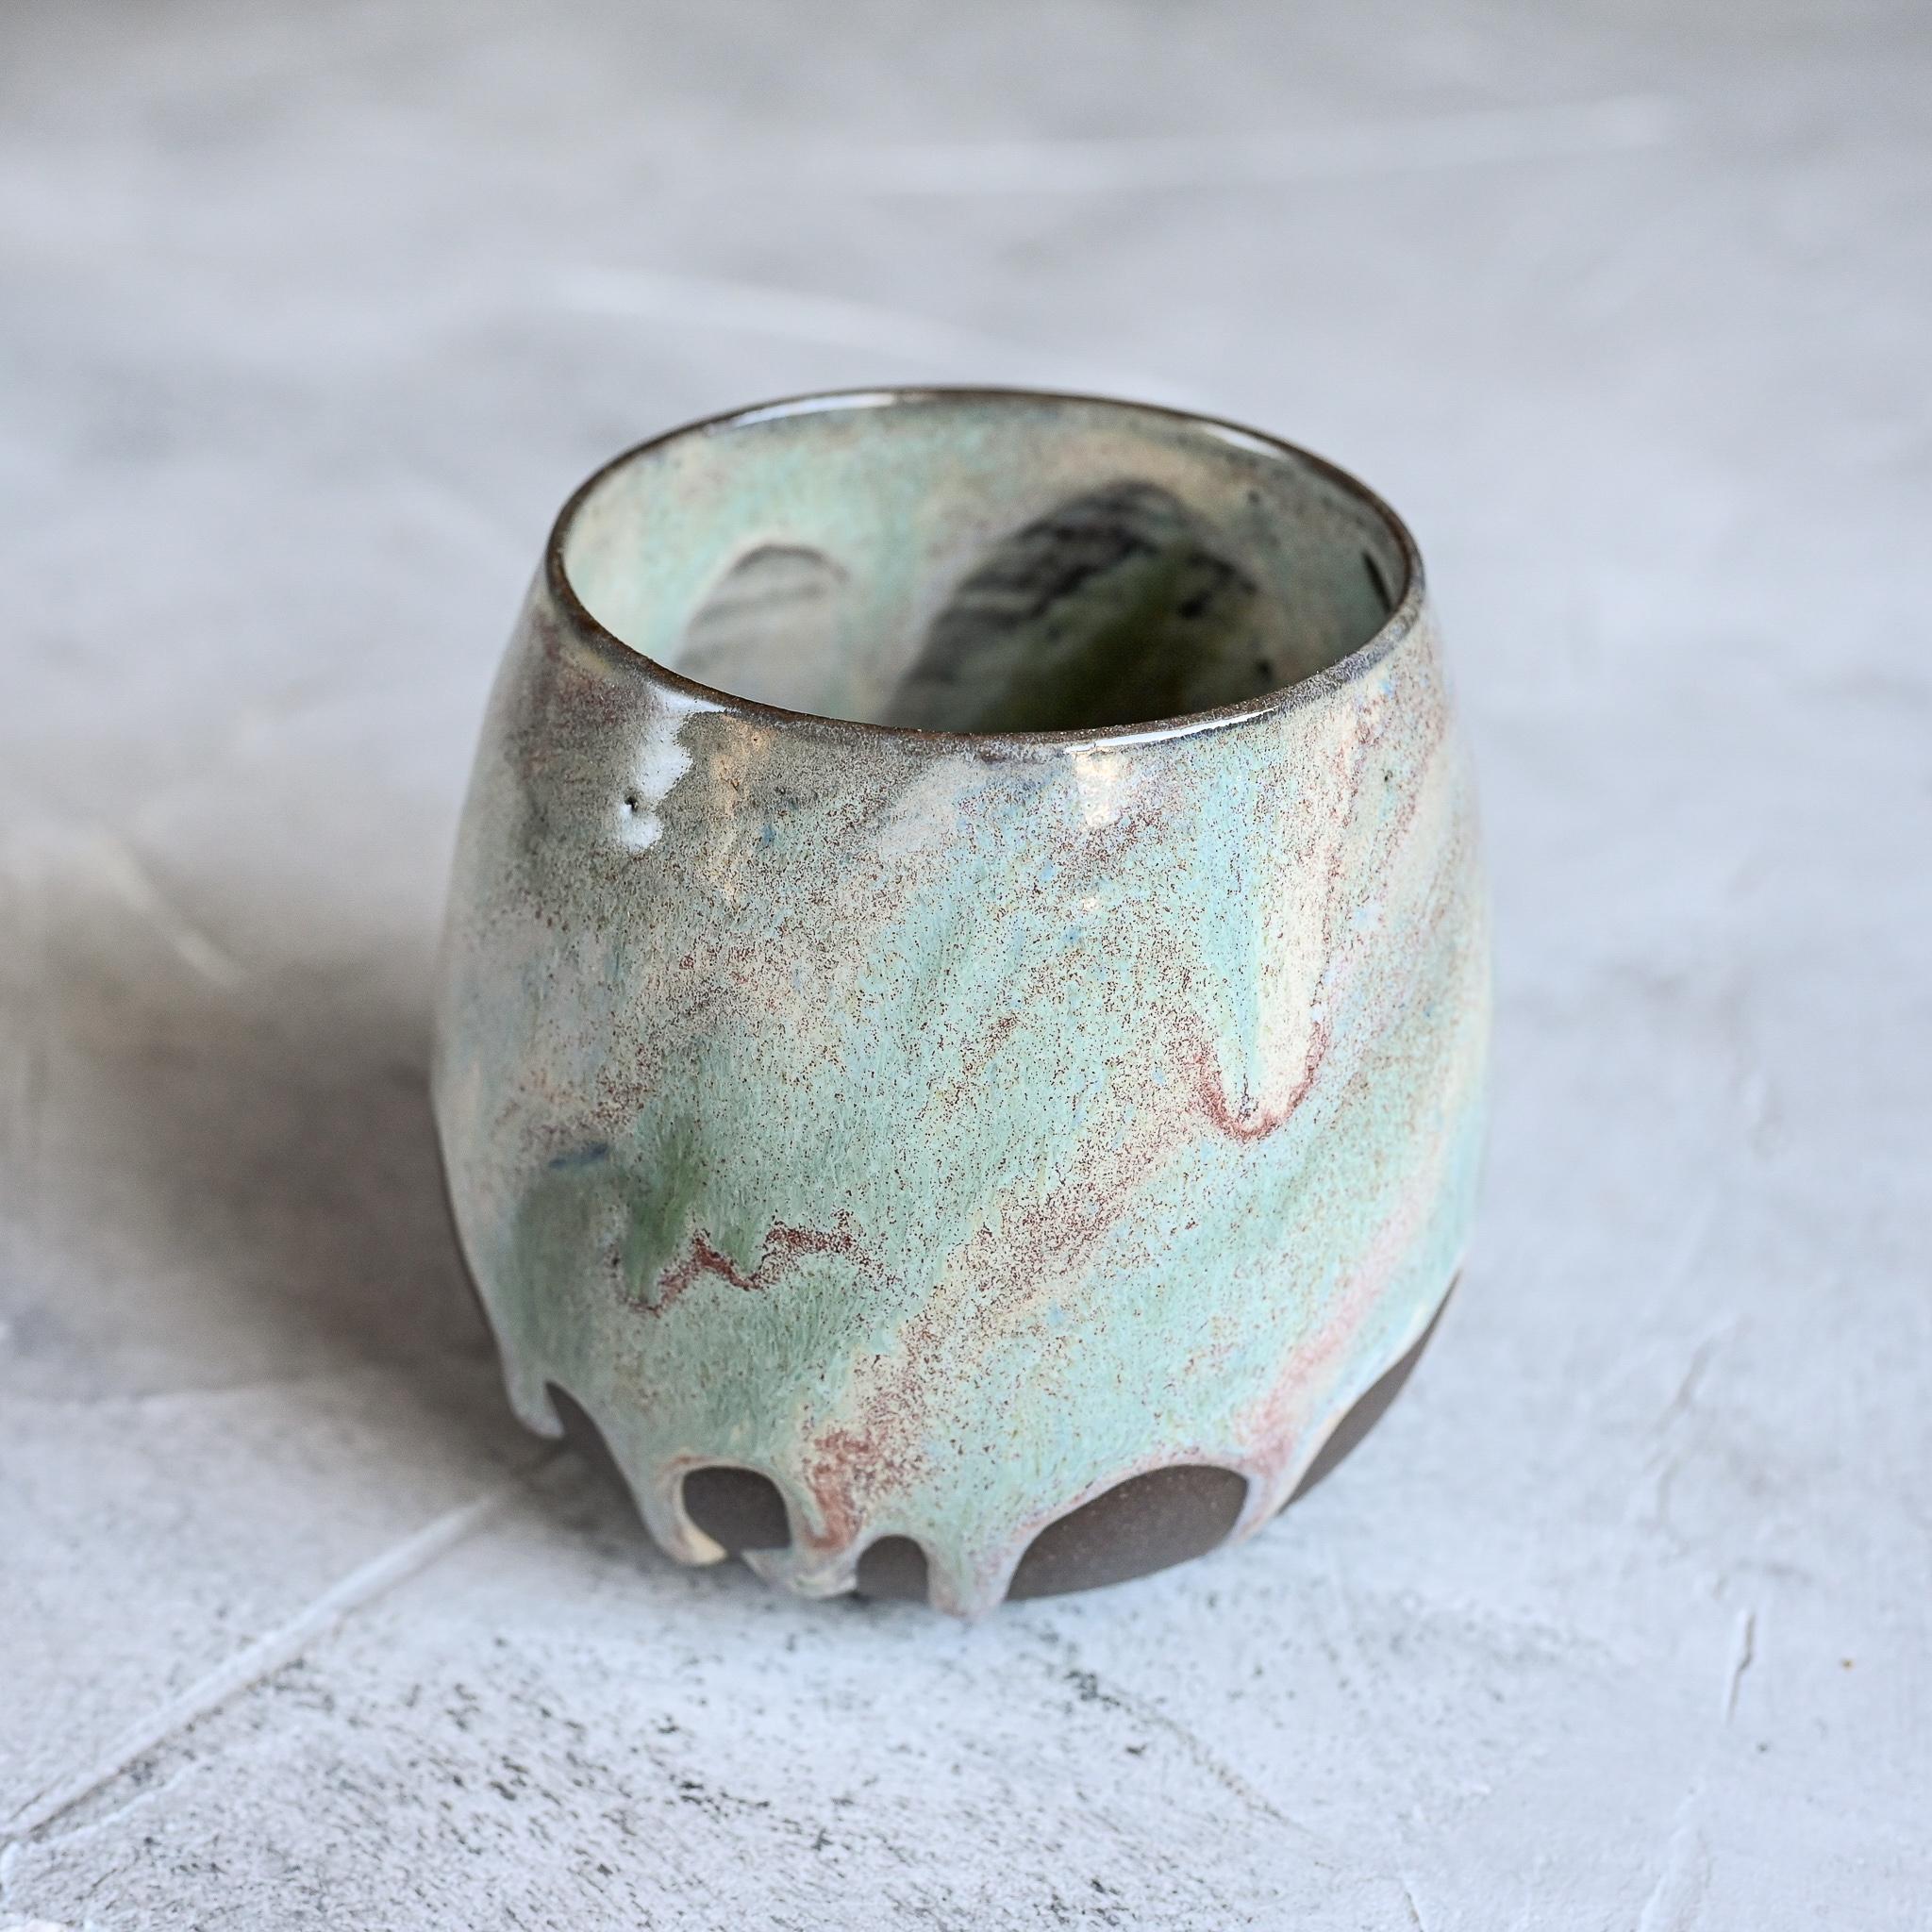 картинка Керамический стакан Марии Левиной 16 - DishWishes.Ru